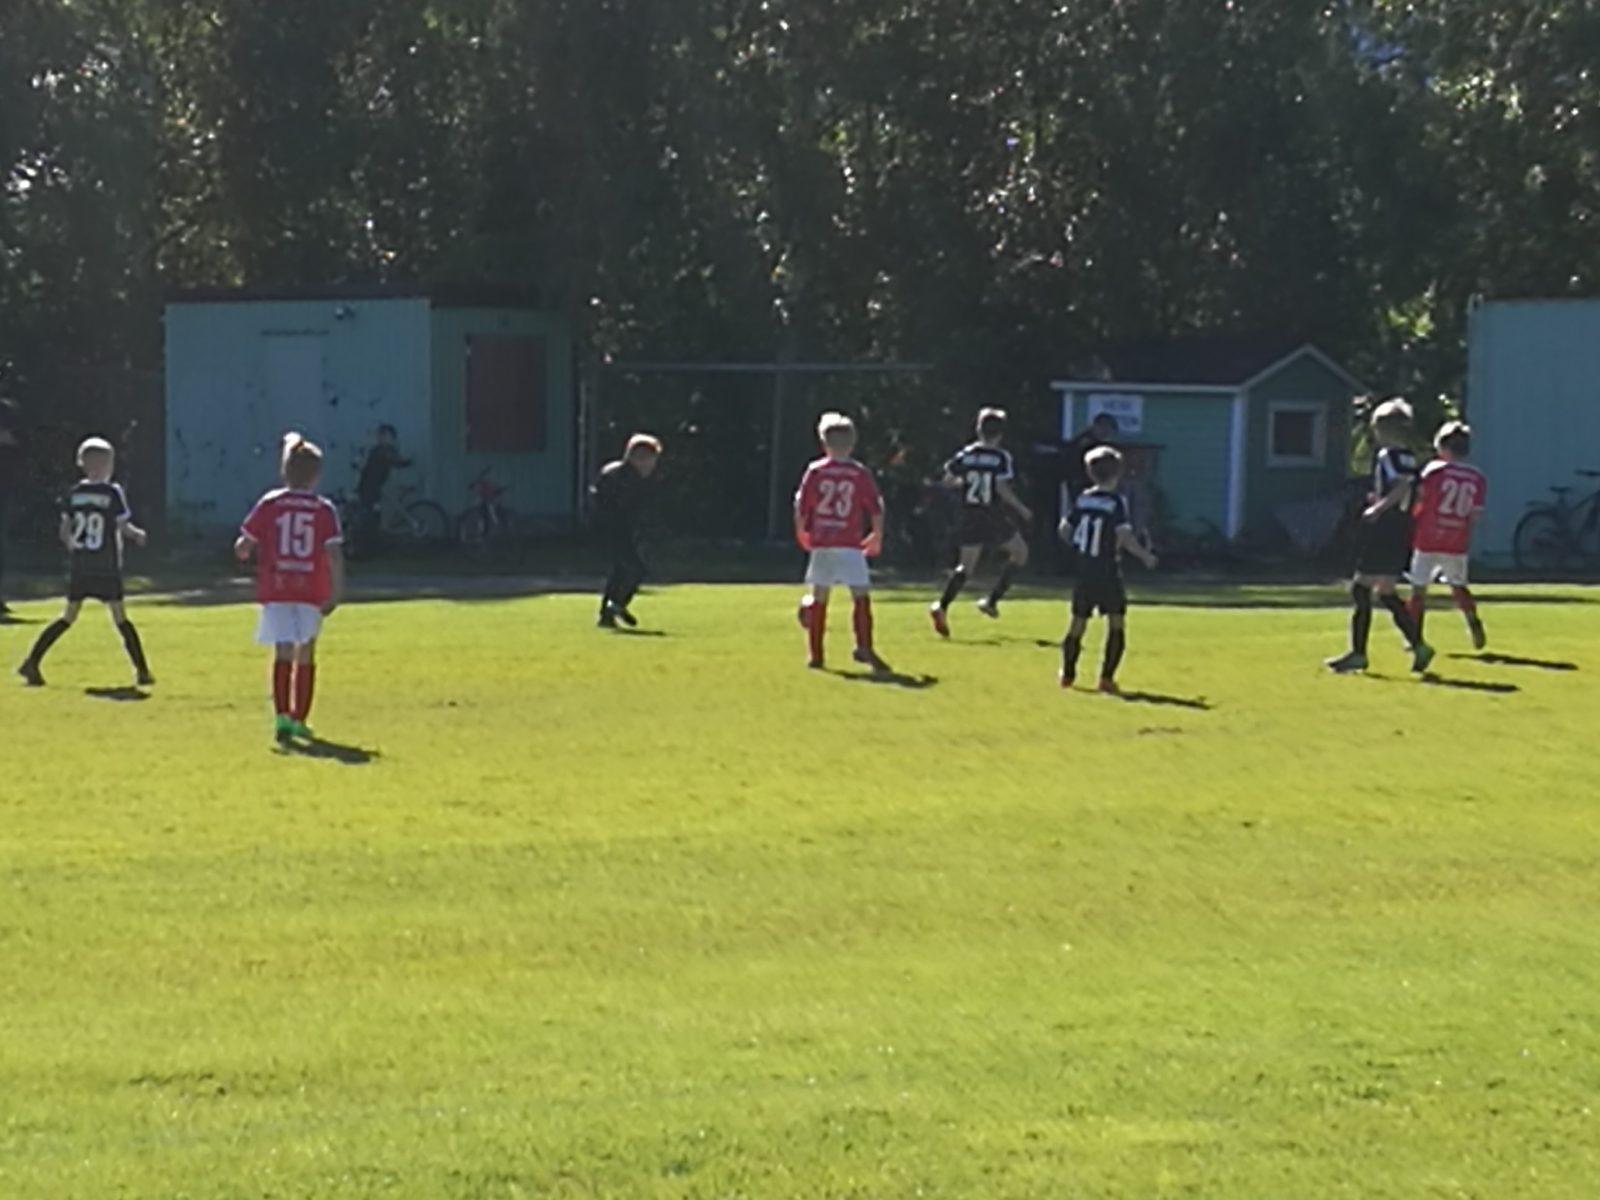 Sporting P10 hemmamatcher mot VPS söndagen 25.08.2019